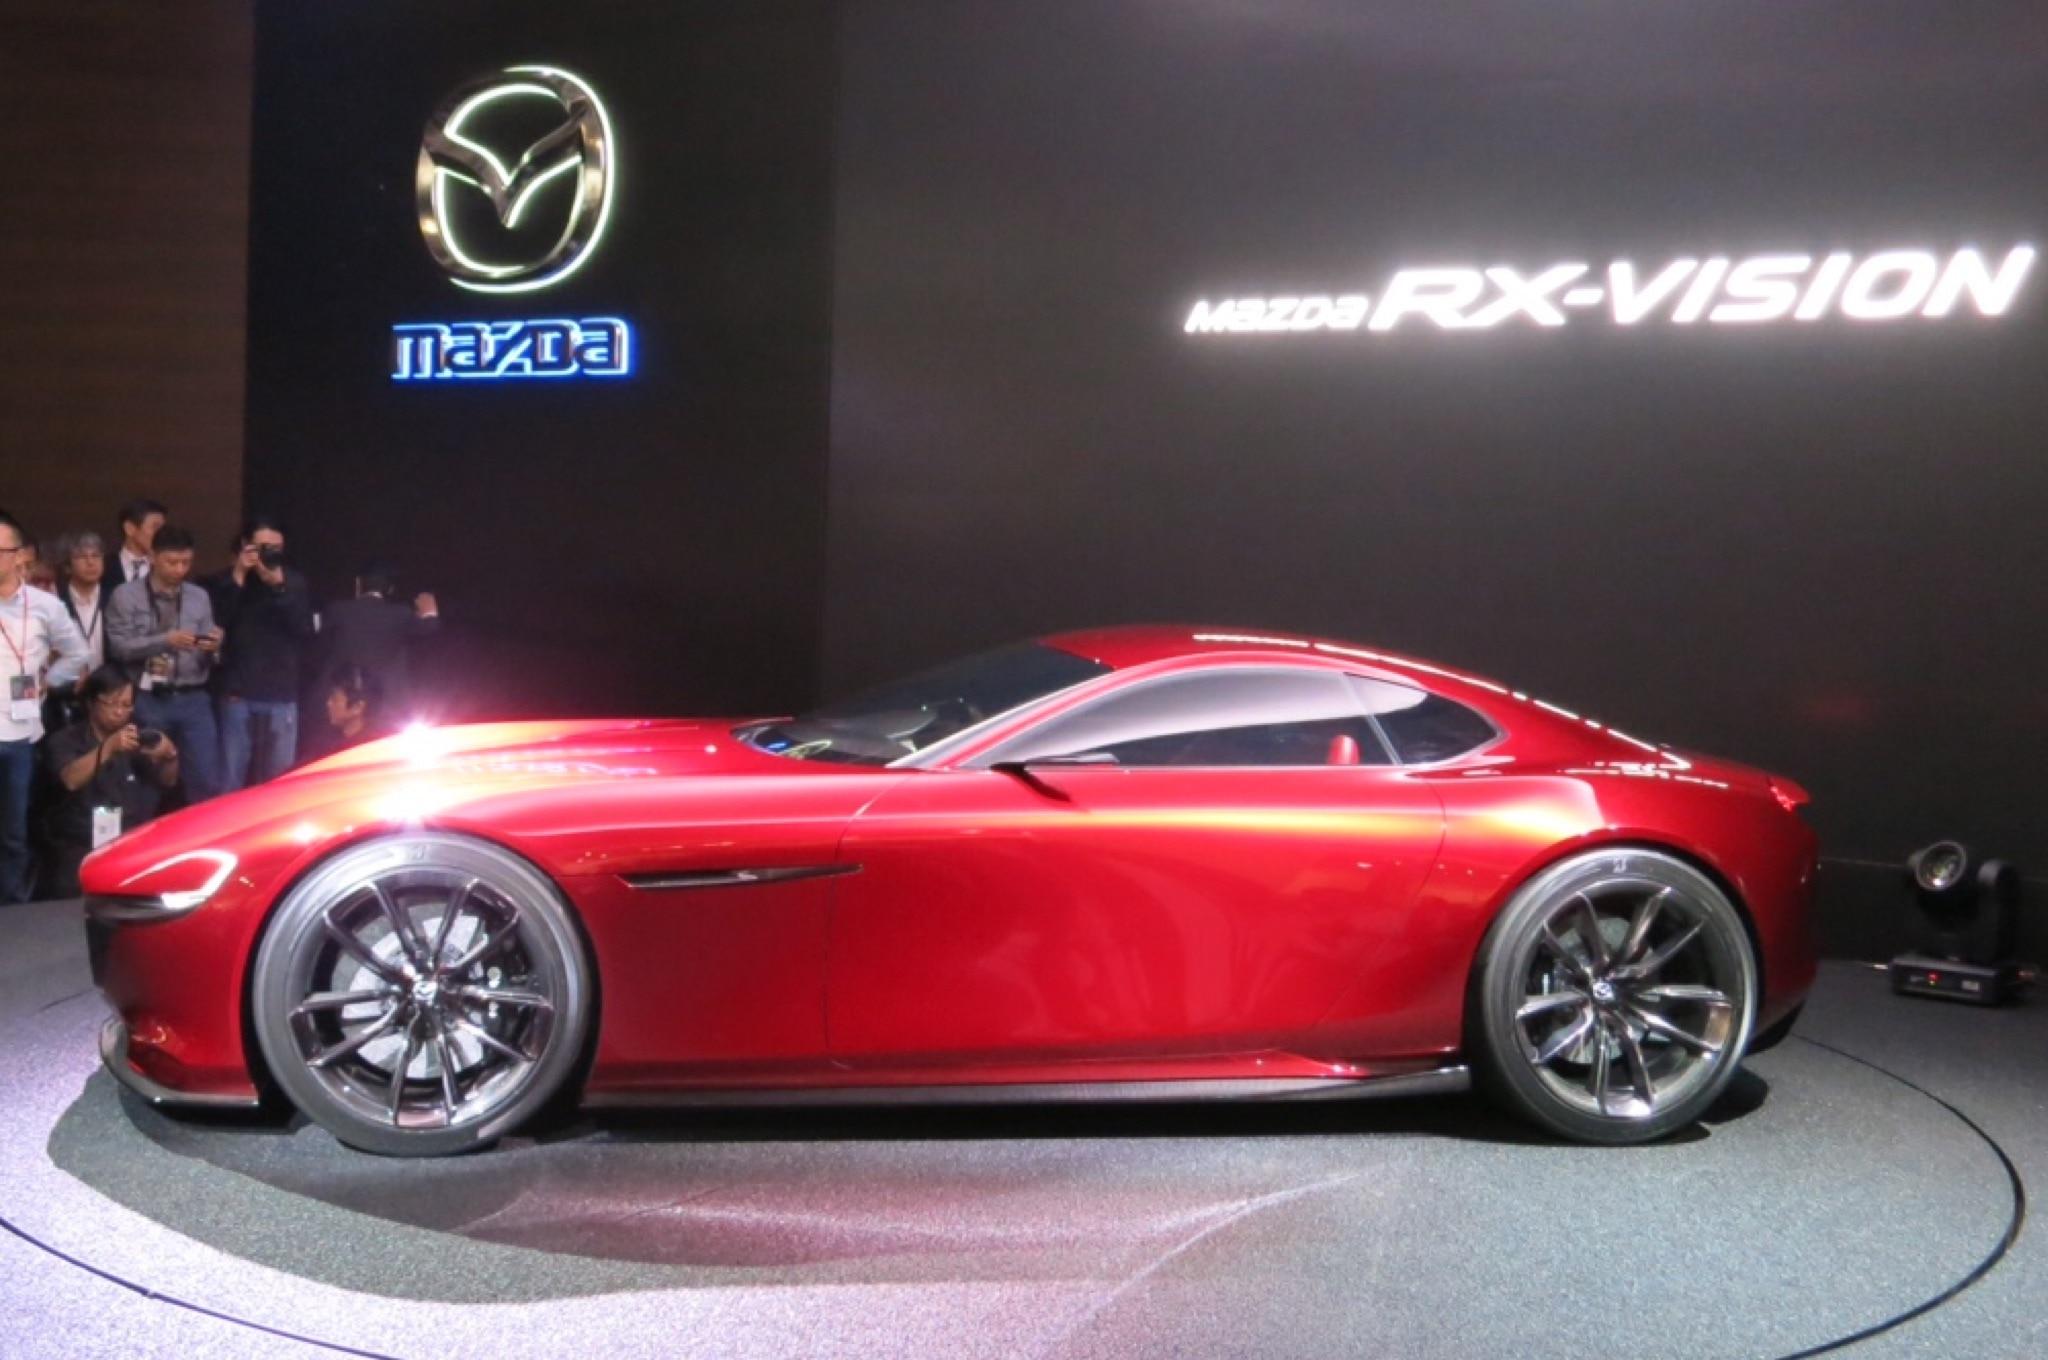 http://st.automobilemag.com/uploads/sites/11/2015/10/Mazda-RX-Vision-concept-live-profile.jpg